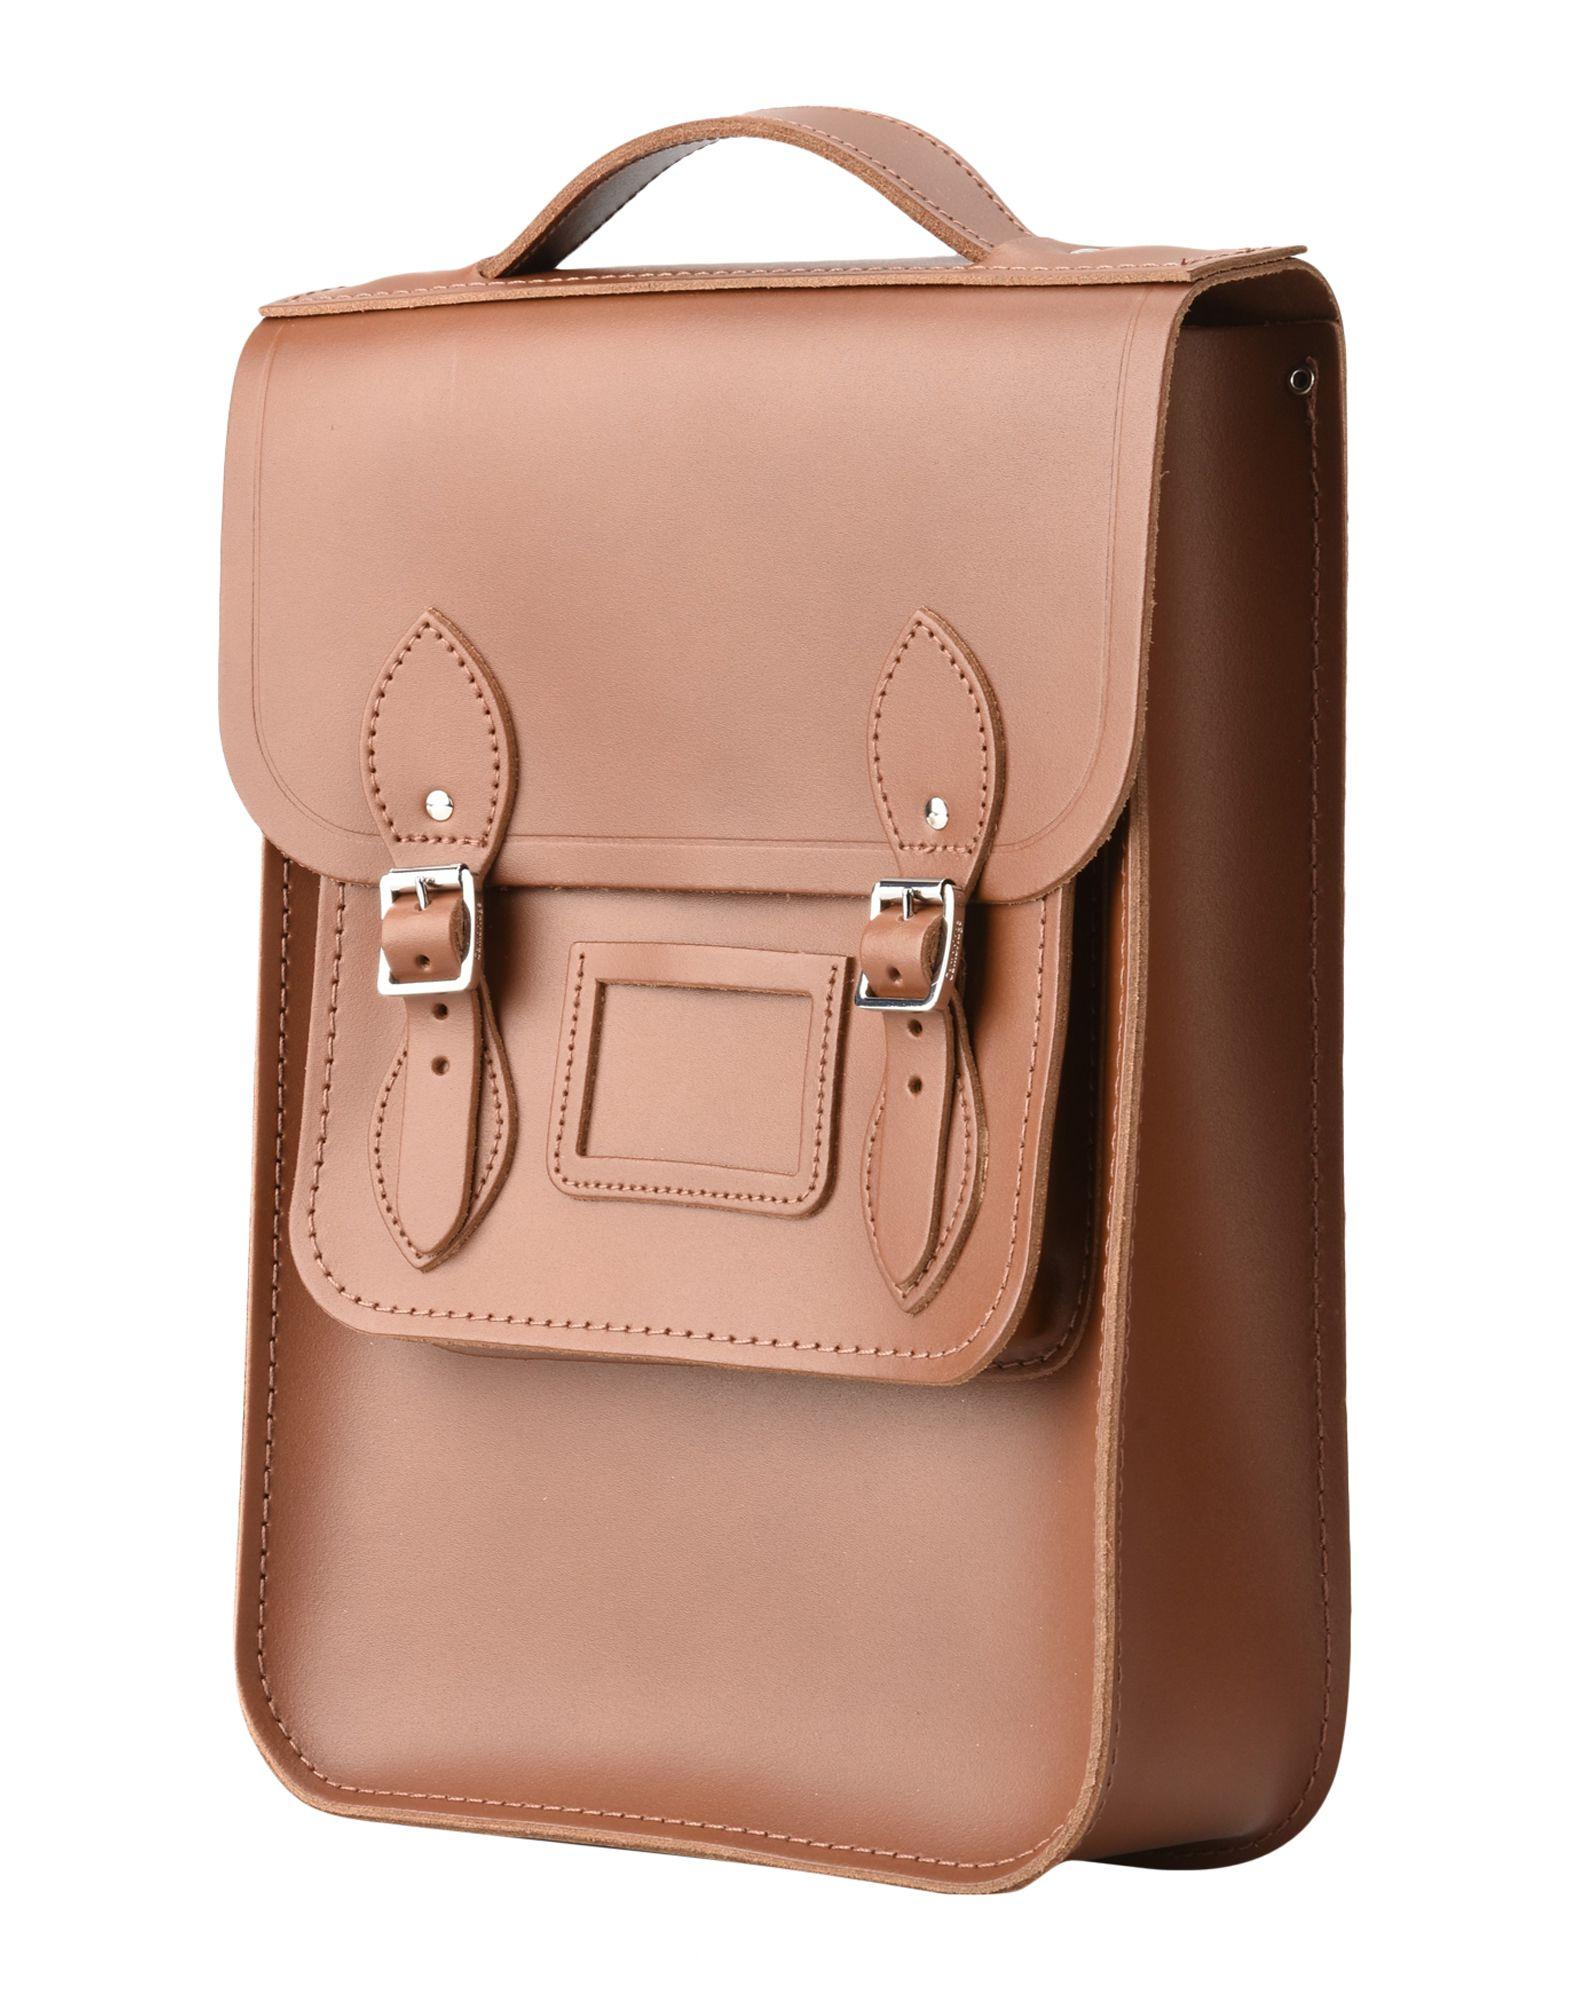 THE CAMBRIDGE SATCHEL COMPANY Рюкзаки и сумки на пояс the cambridge satchel company деловые сумки